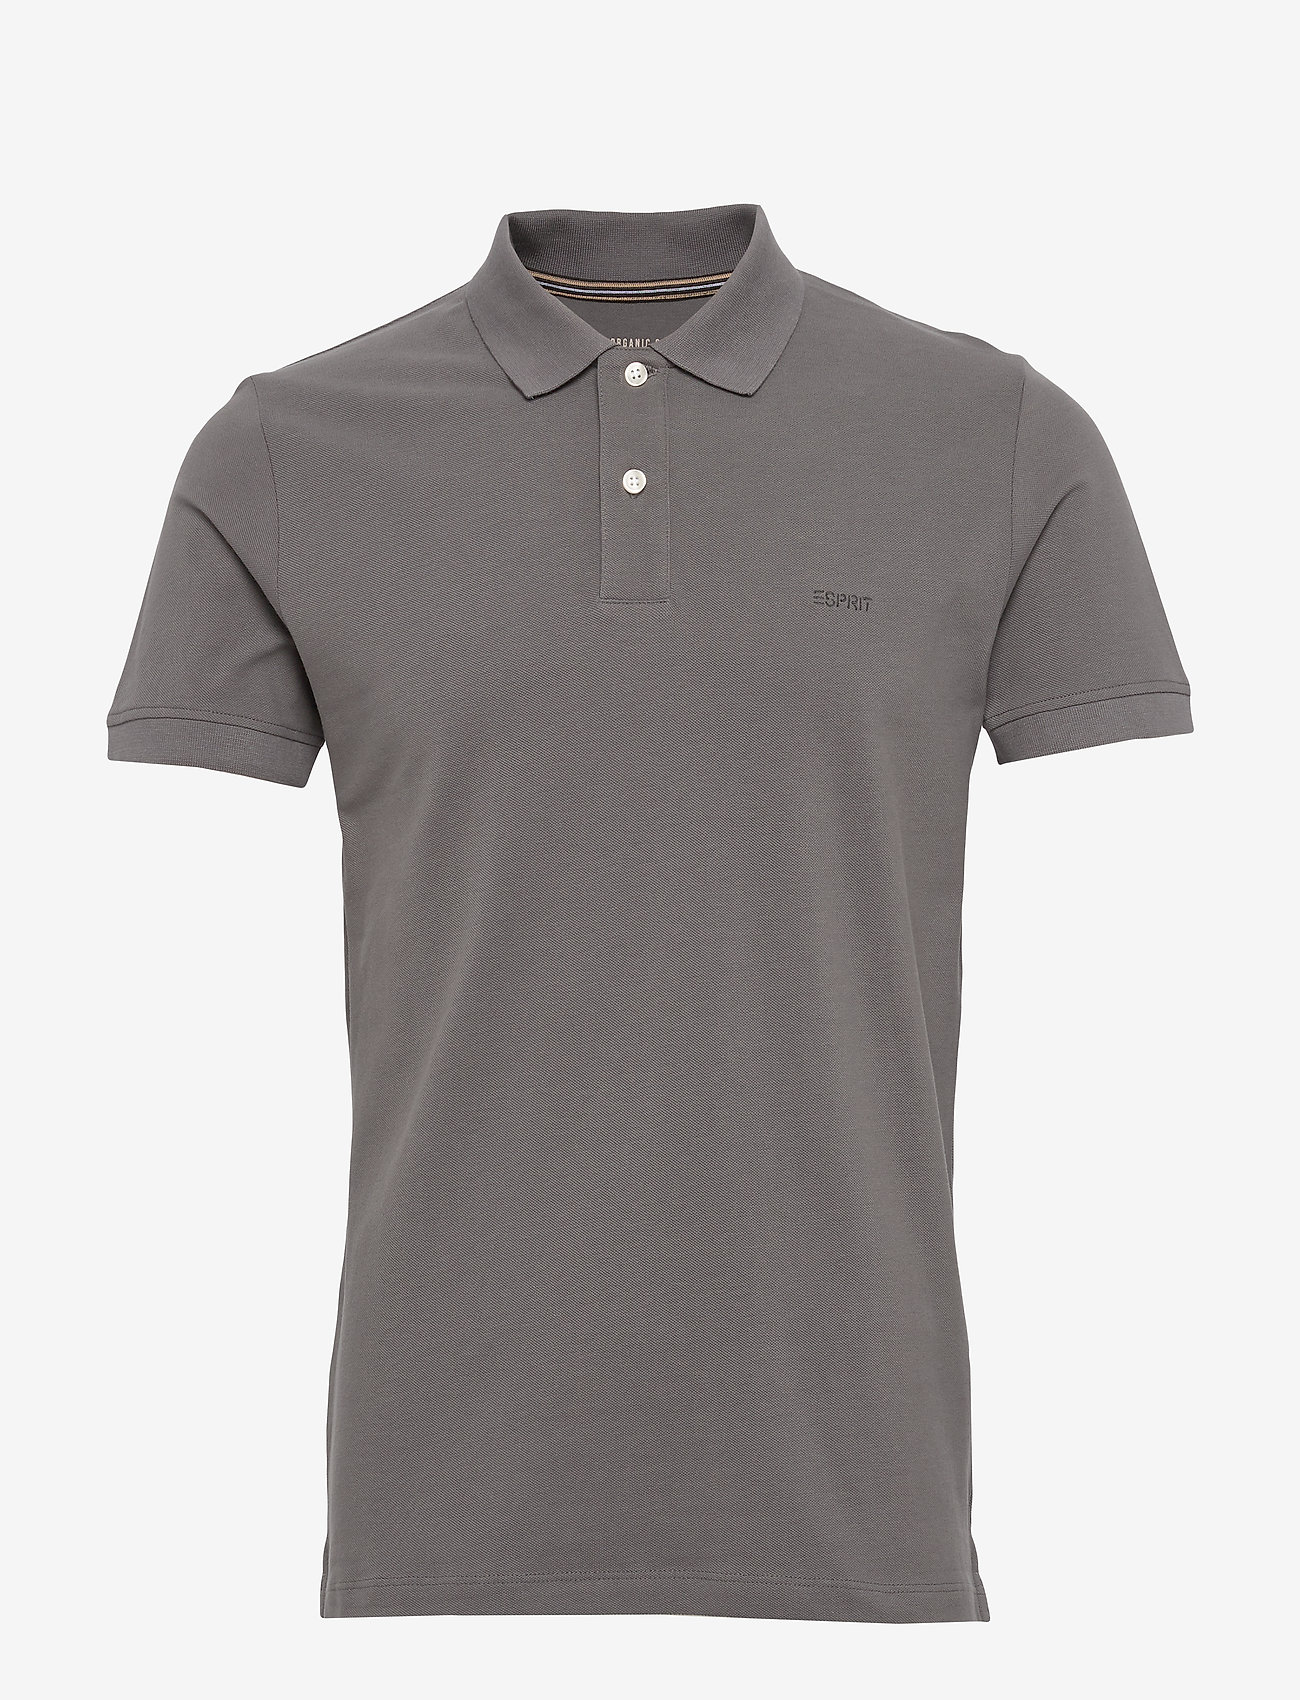 Esprit Casual - Polo shirts - short-sleeved polos - dark grey - 0